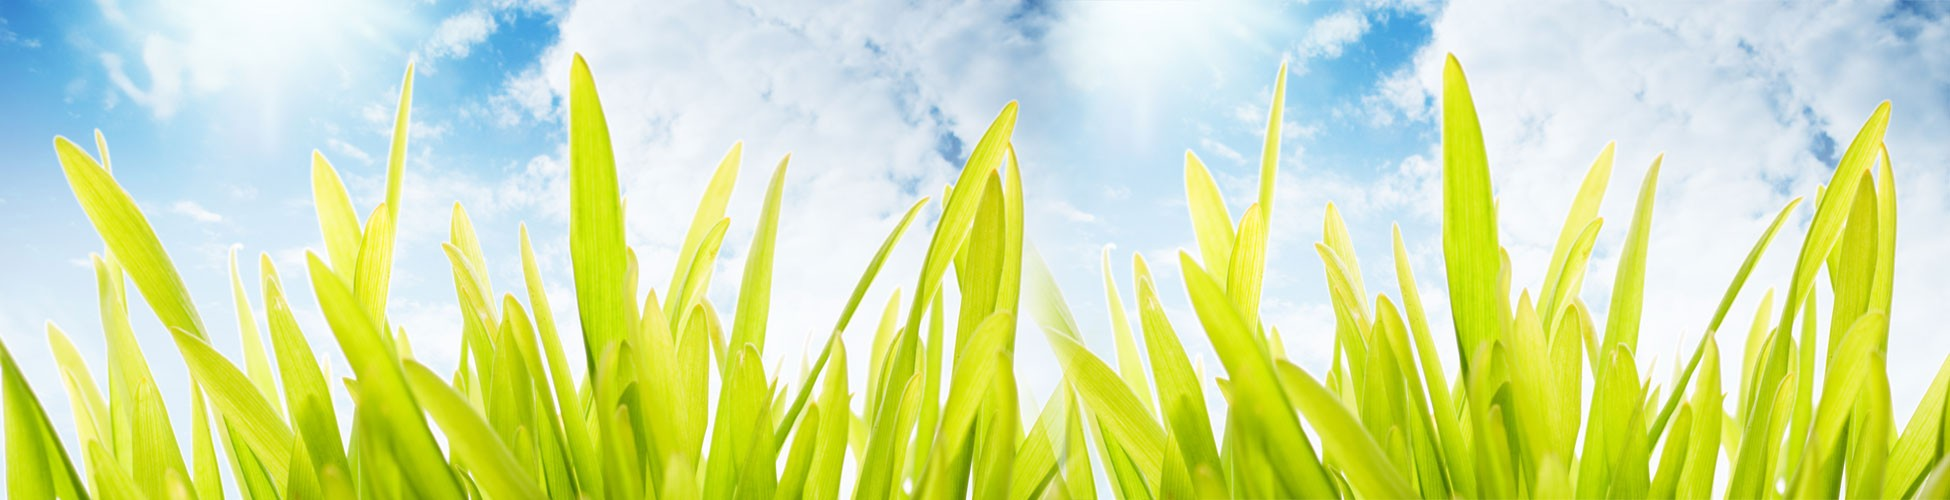 grass header banner - lawn seed - grass seed - spring grass seed